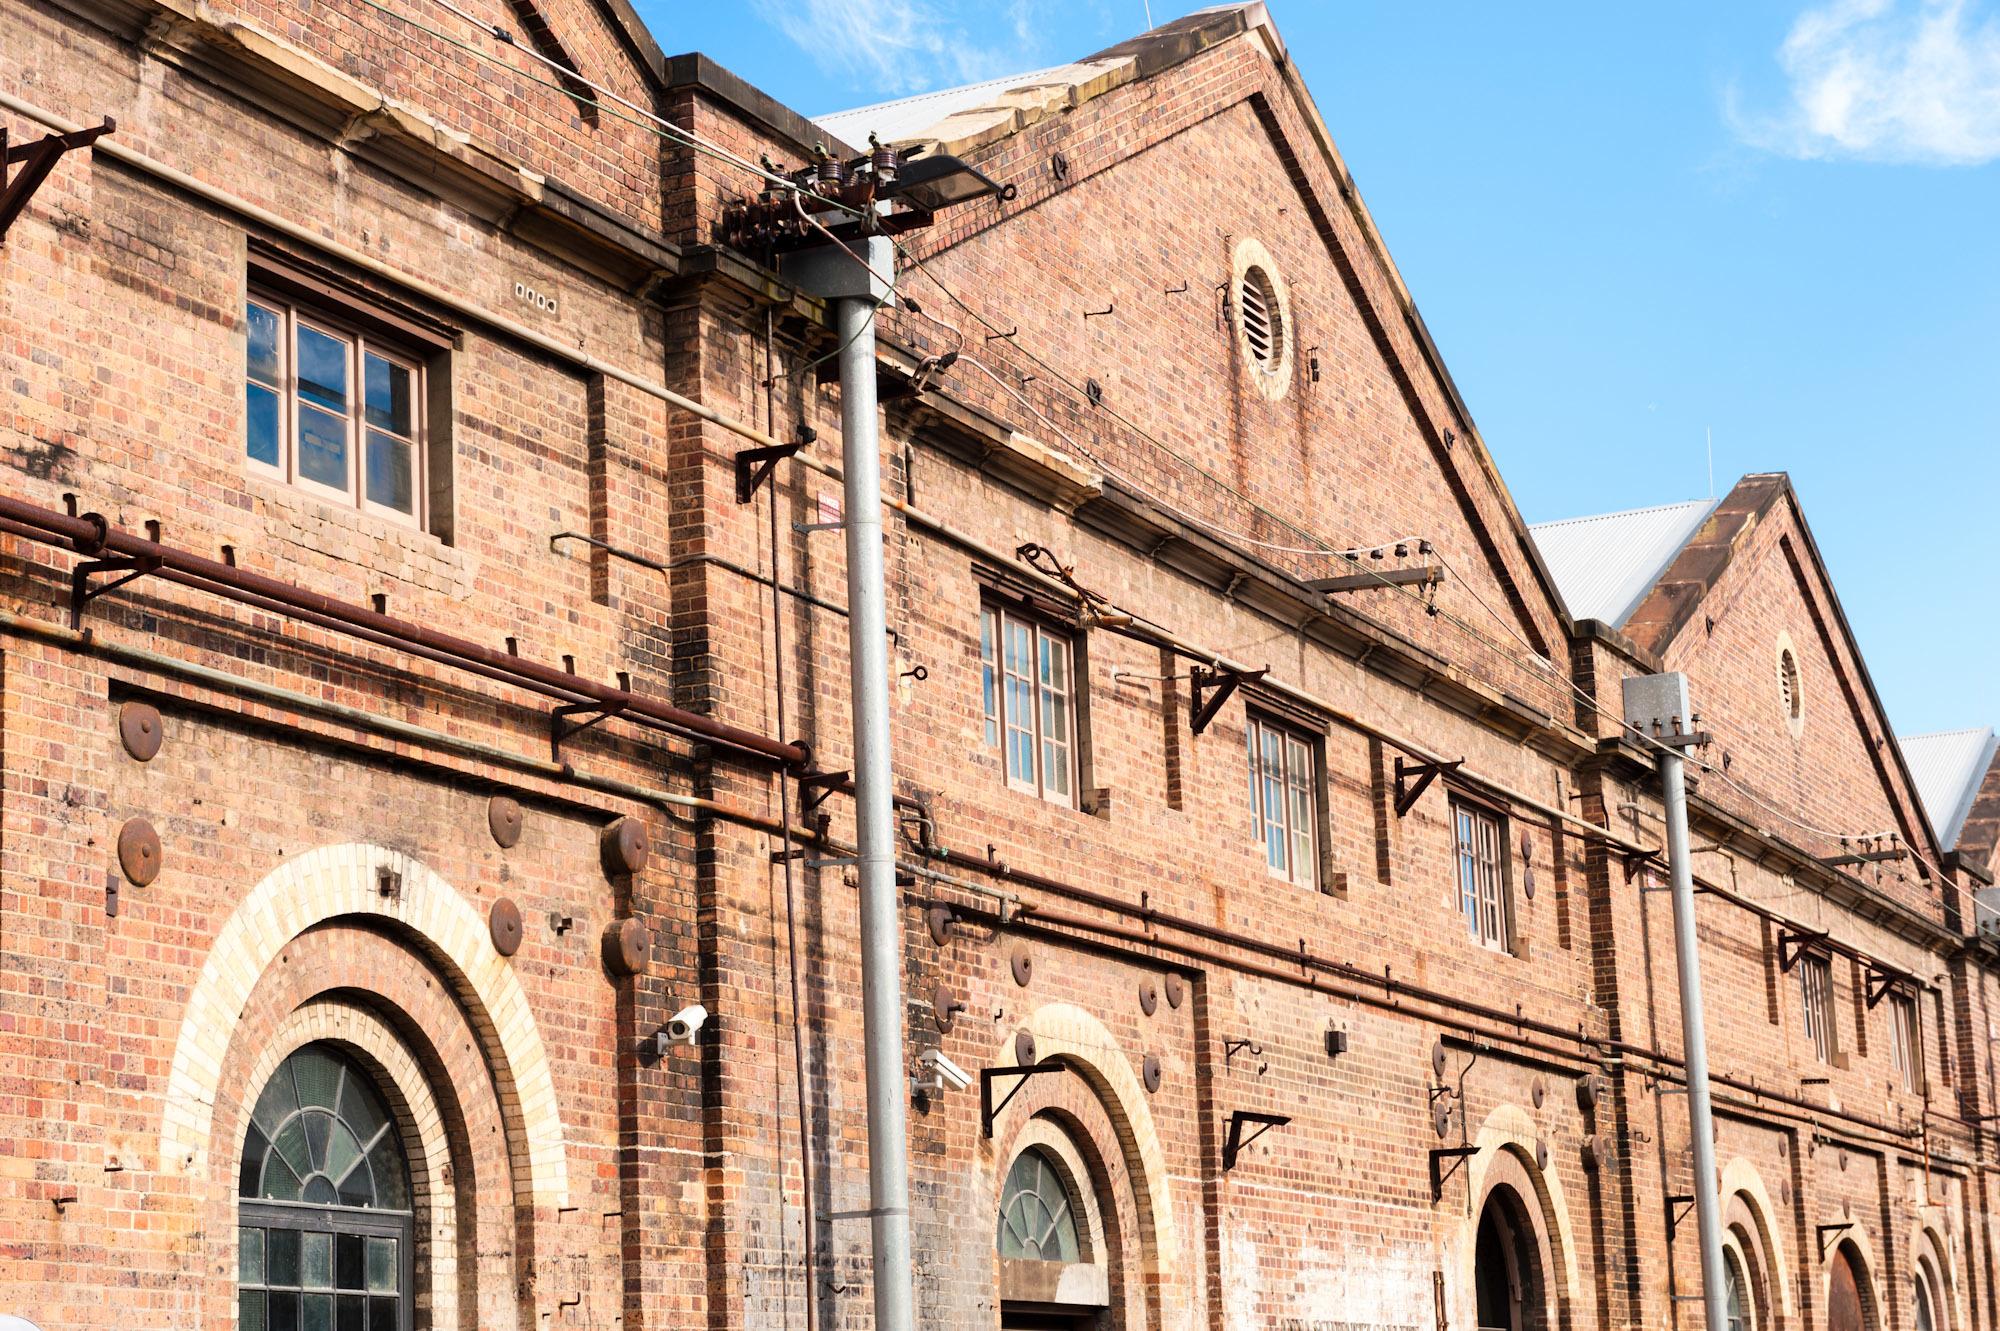 Carriageworks external shot